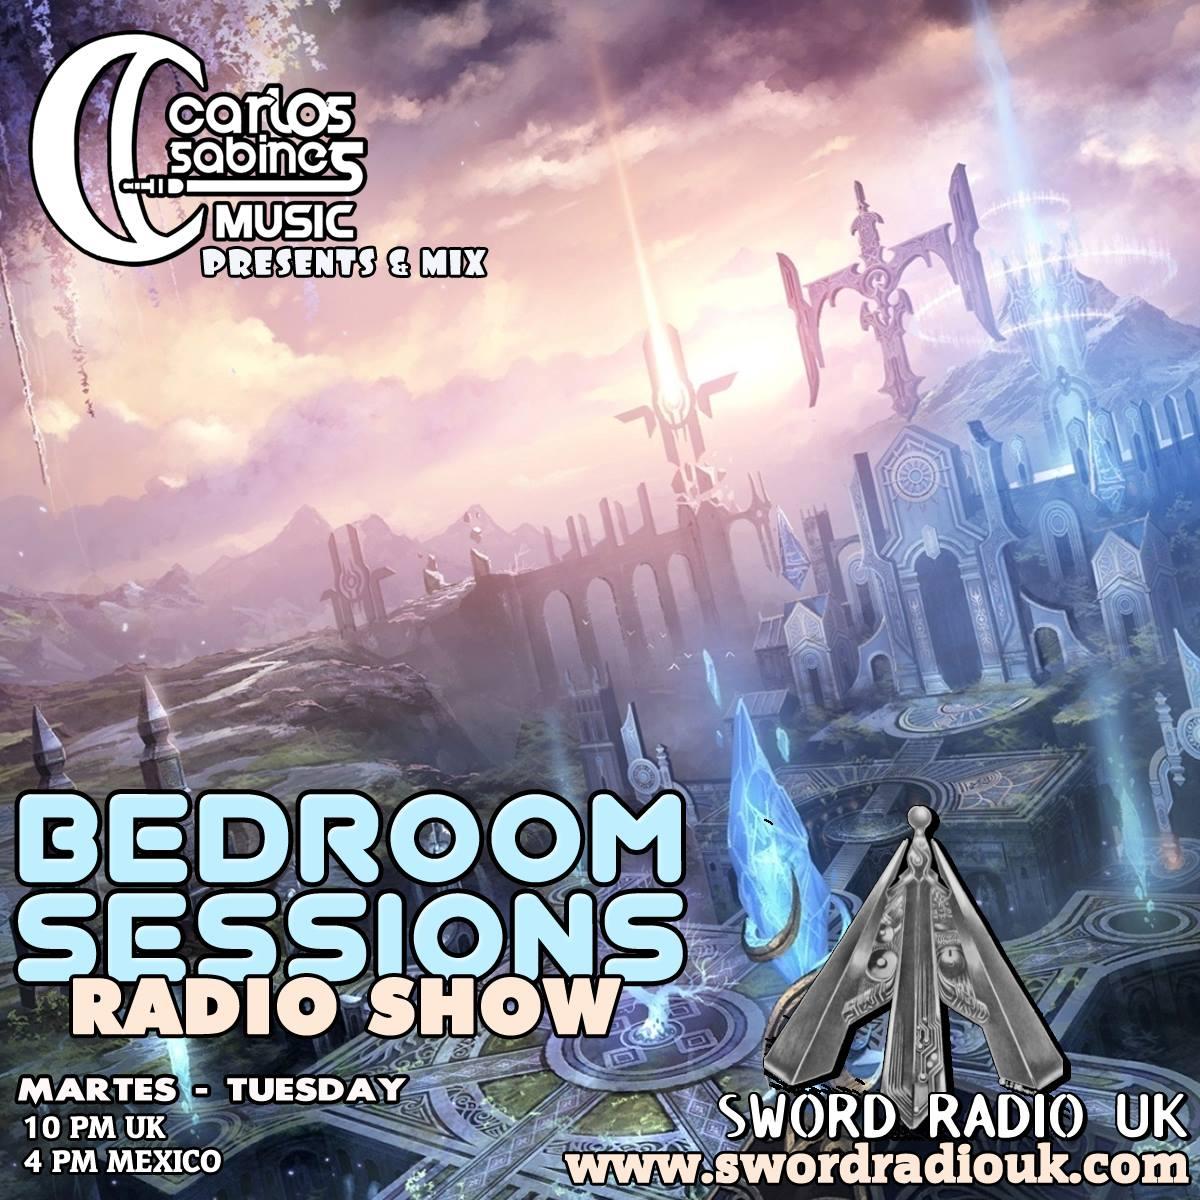 Coming up my #BedroomSessionsRadioShow transmisión desde #ReinoUnido  broadcast from #UK   http://www. swordradiouk.com       10 pm UK  4 pm #México  #RadioShow #Radio #Trance #TranceFamily #RT #DJLife #CarlosSabines<br>http://pic.twitter.com/iFzeKbvpFe